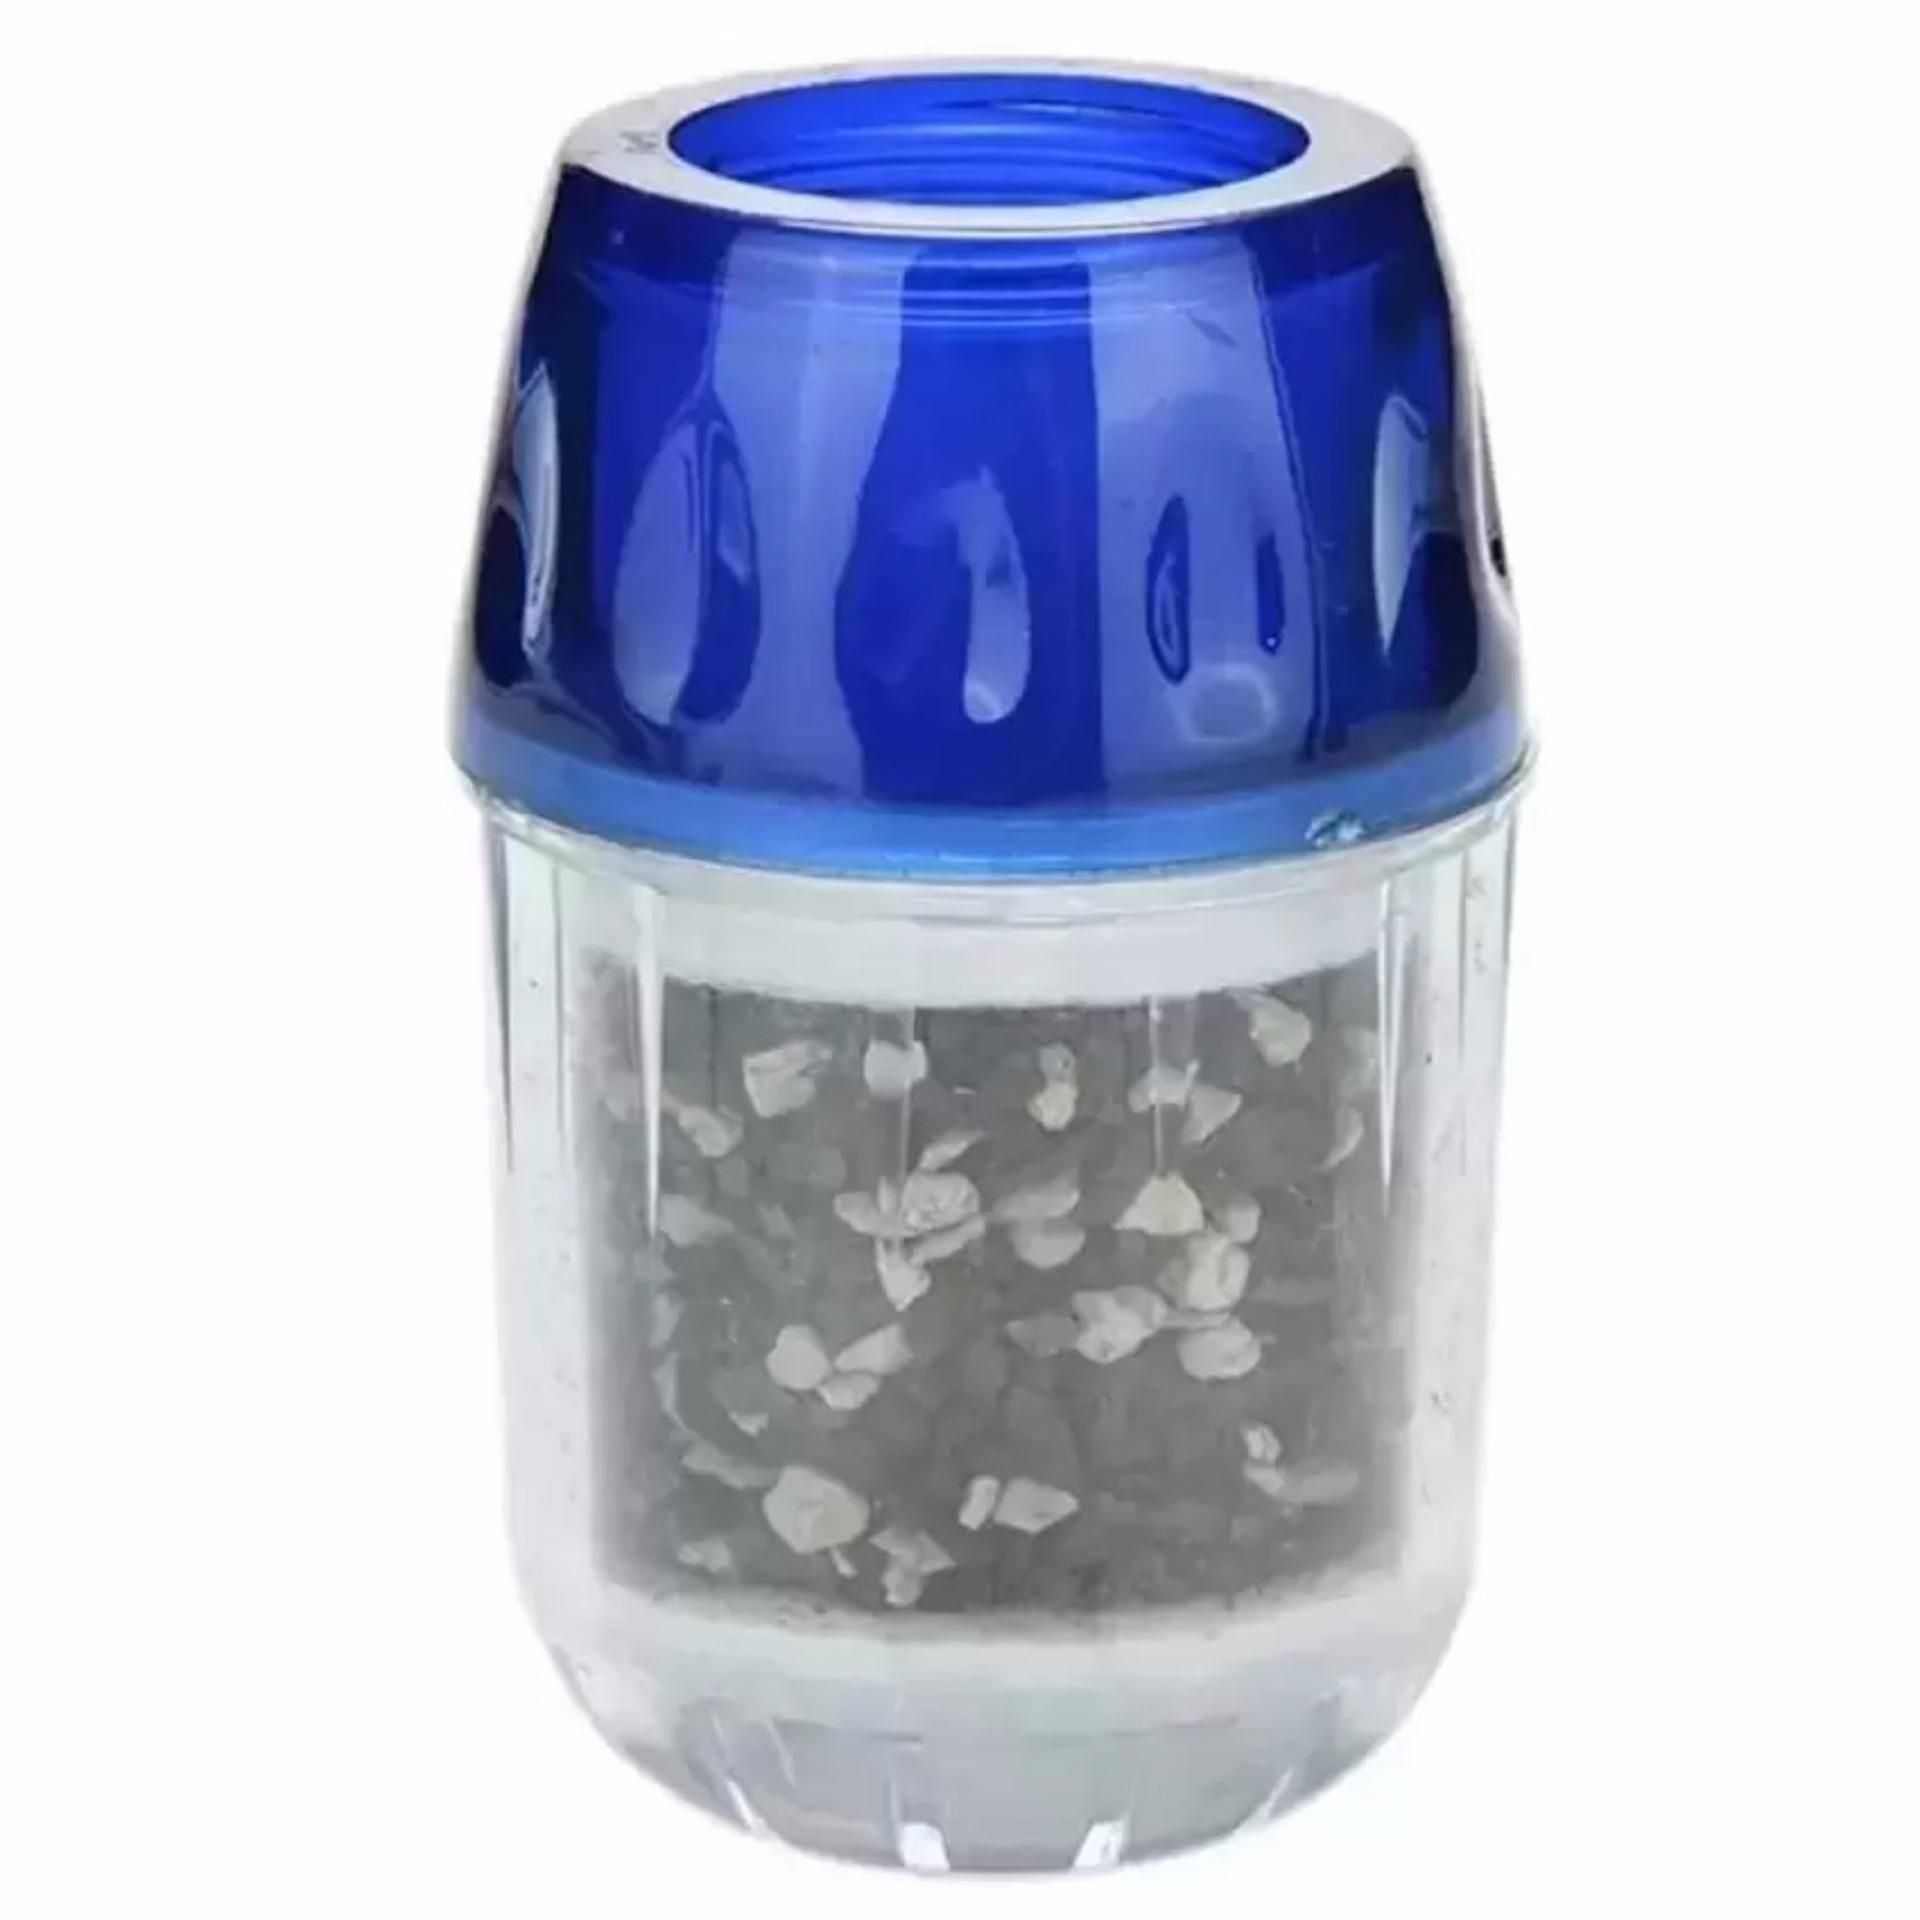 Water Purified Faucet Saringan Atau Filter Air Kran Hy 29 Daftar Nikita Corong Keran